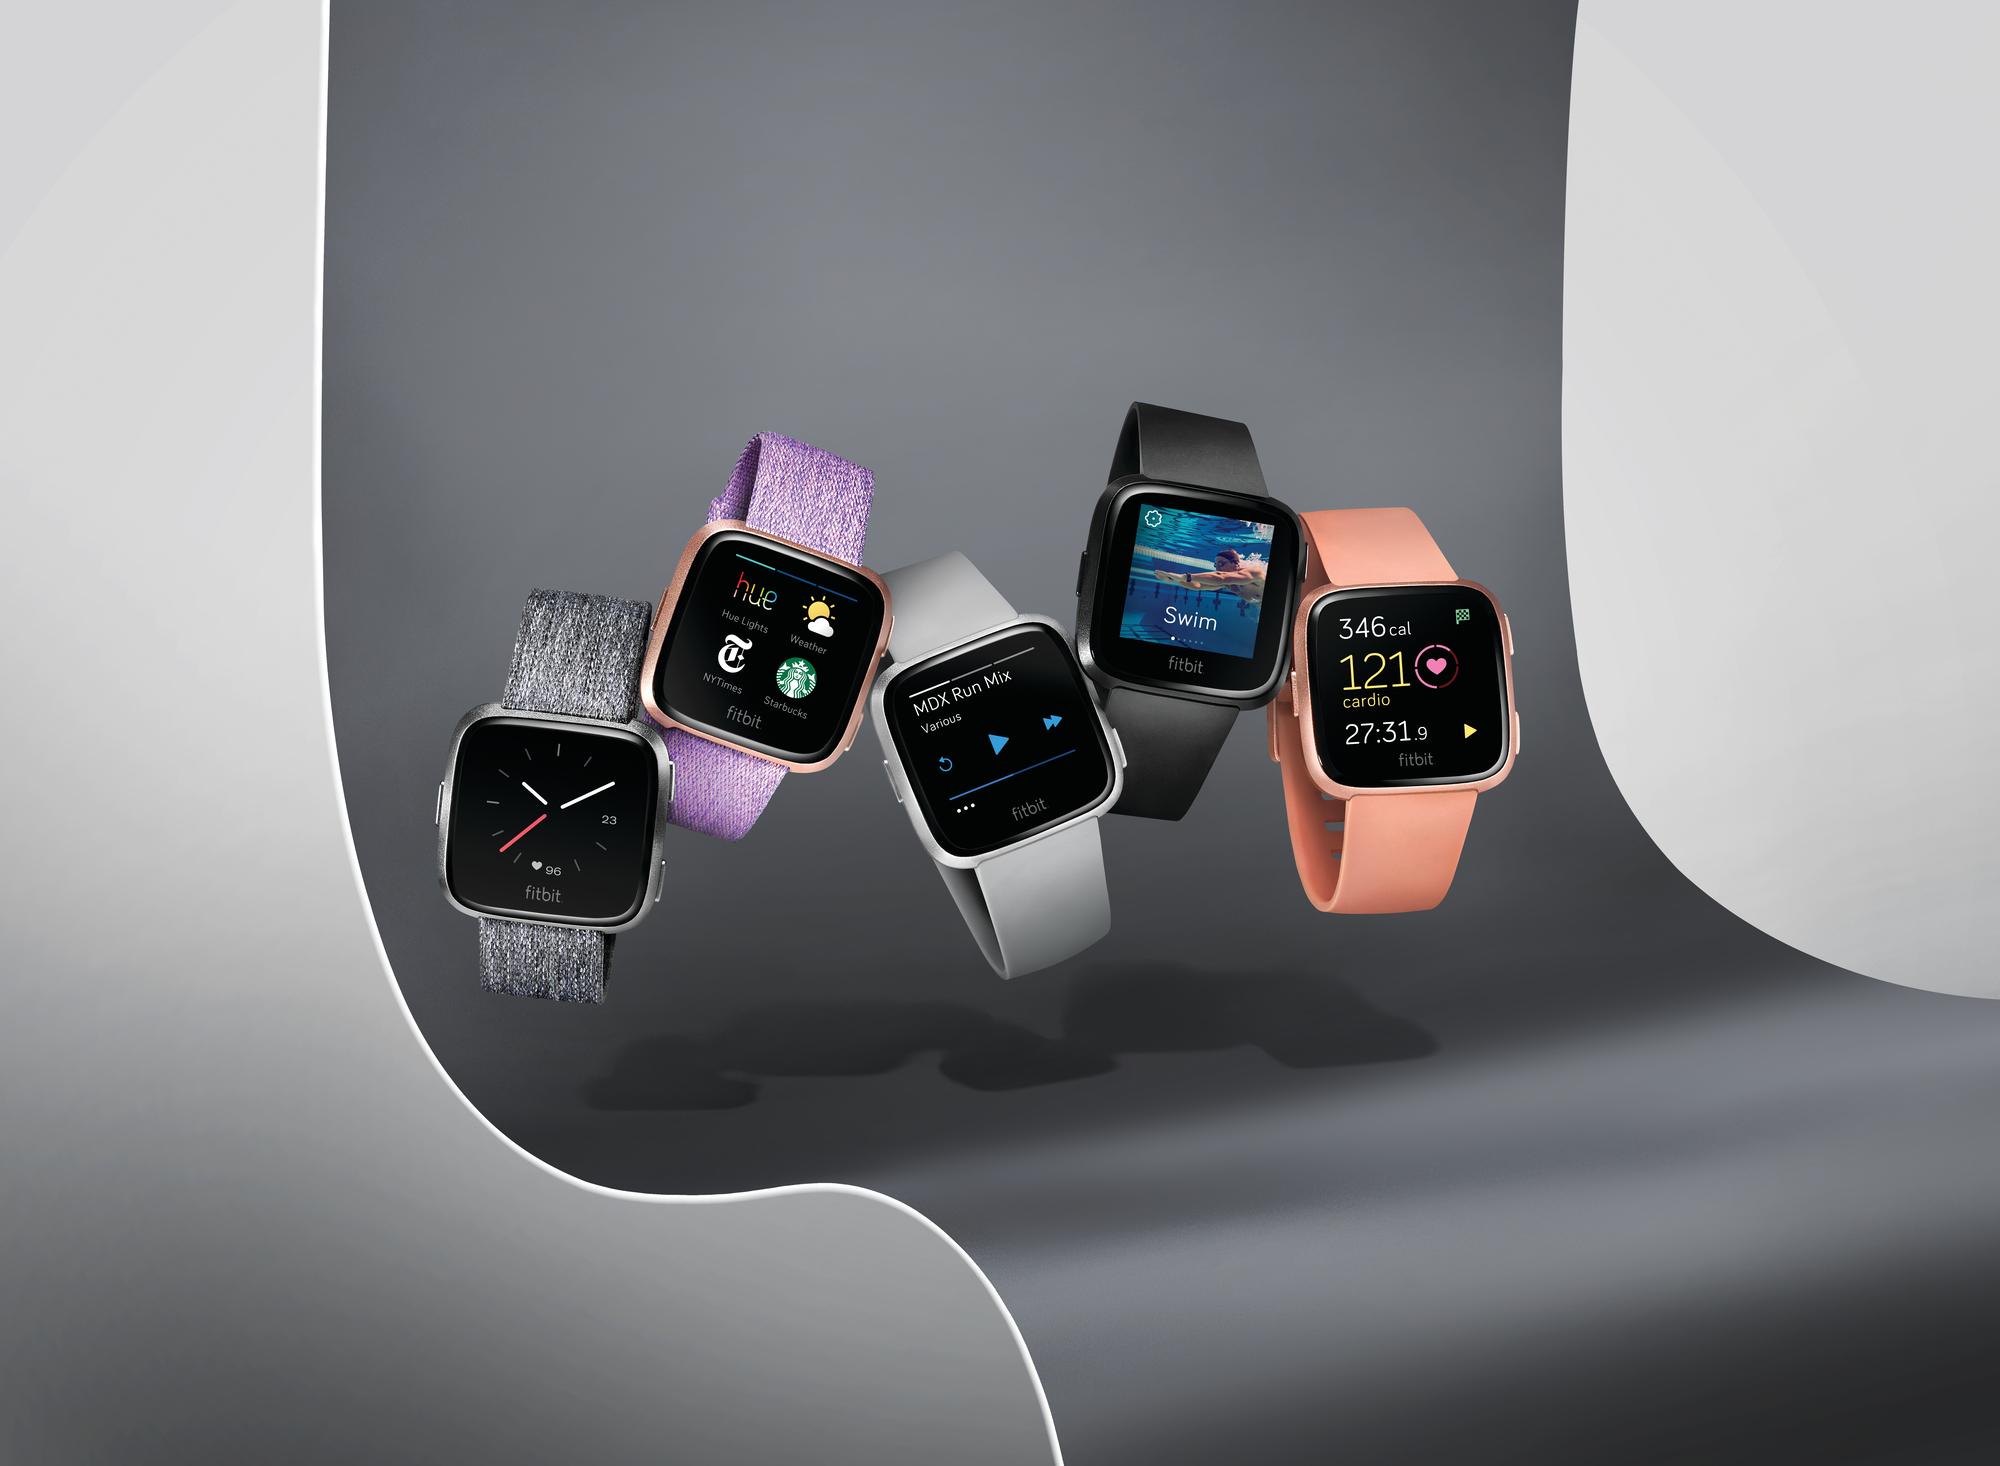 Fitbit's new Versa smartwatch